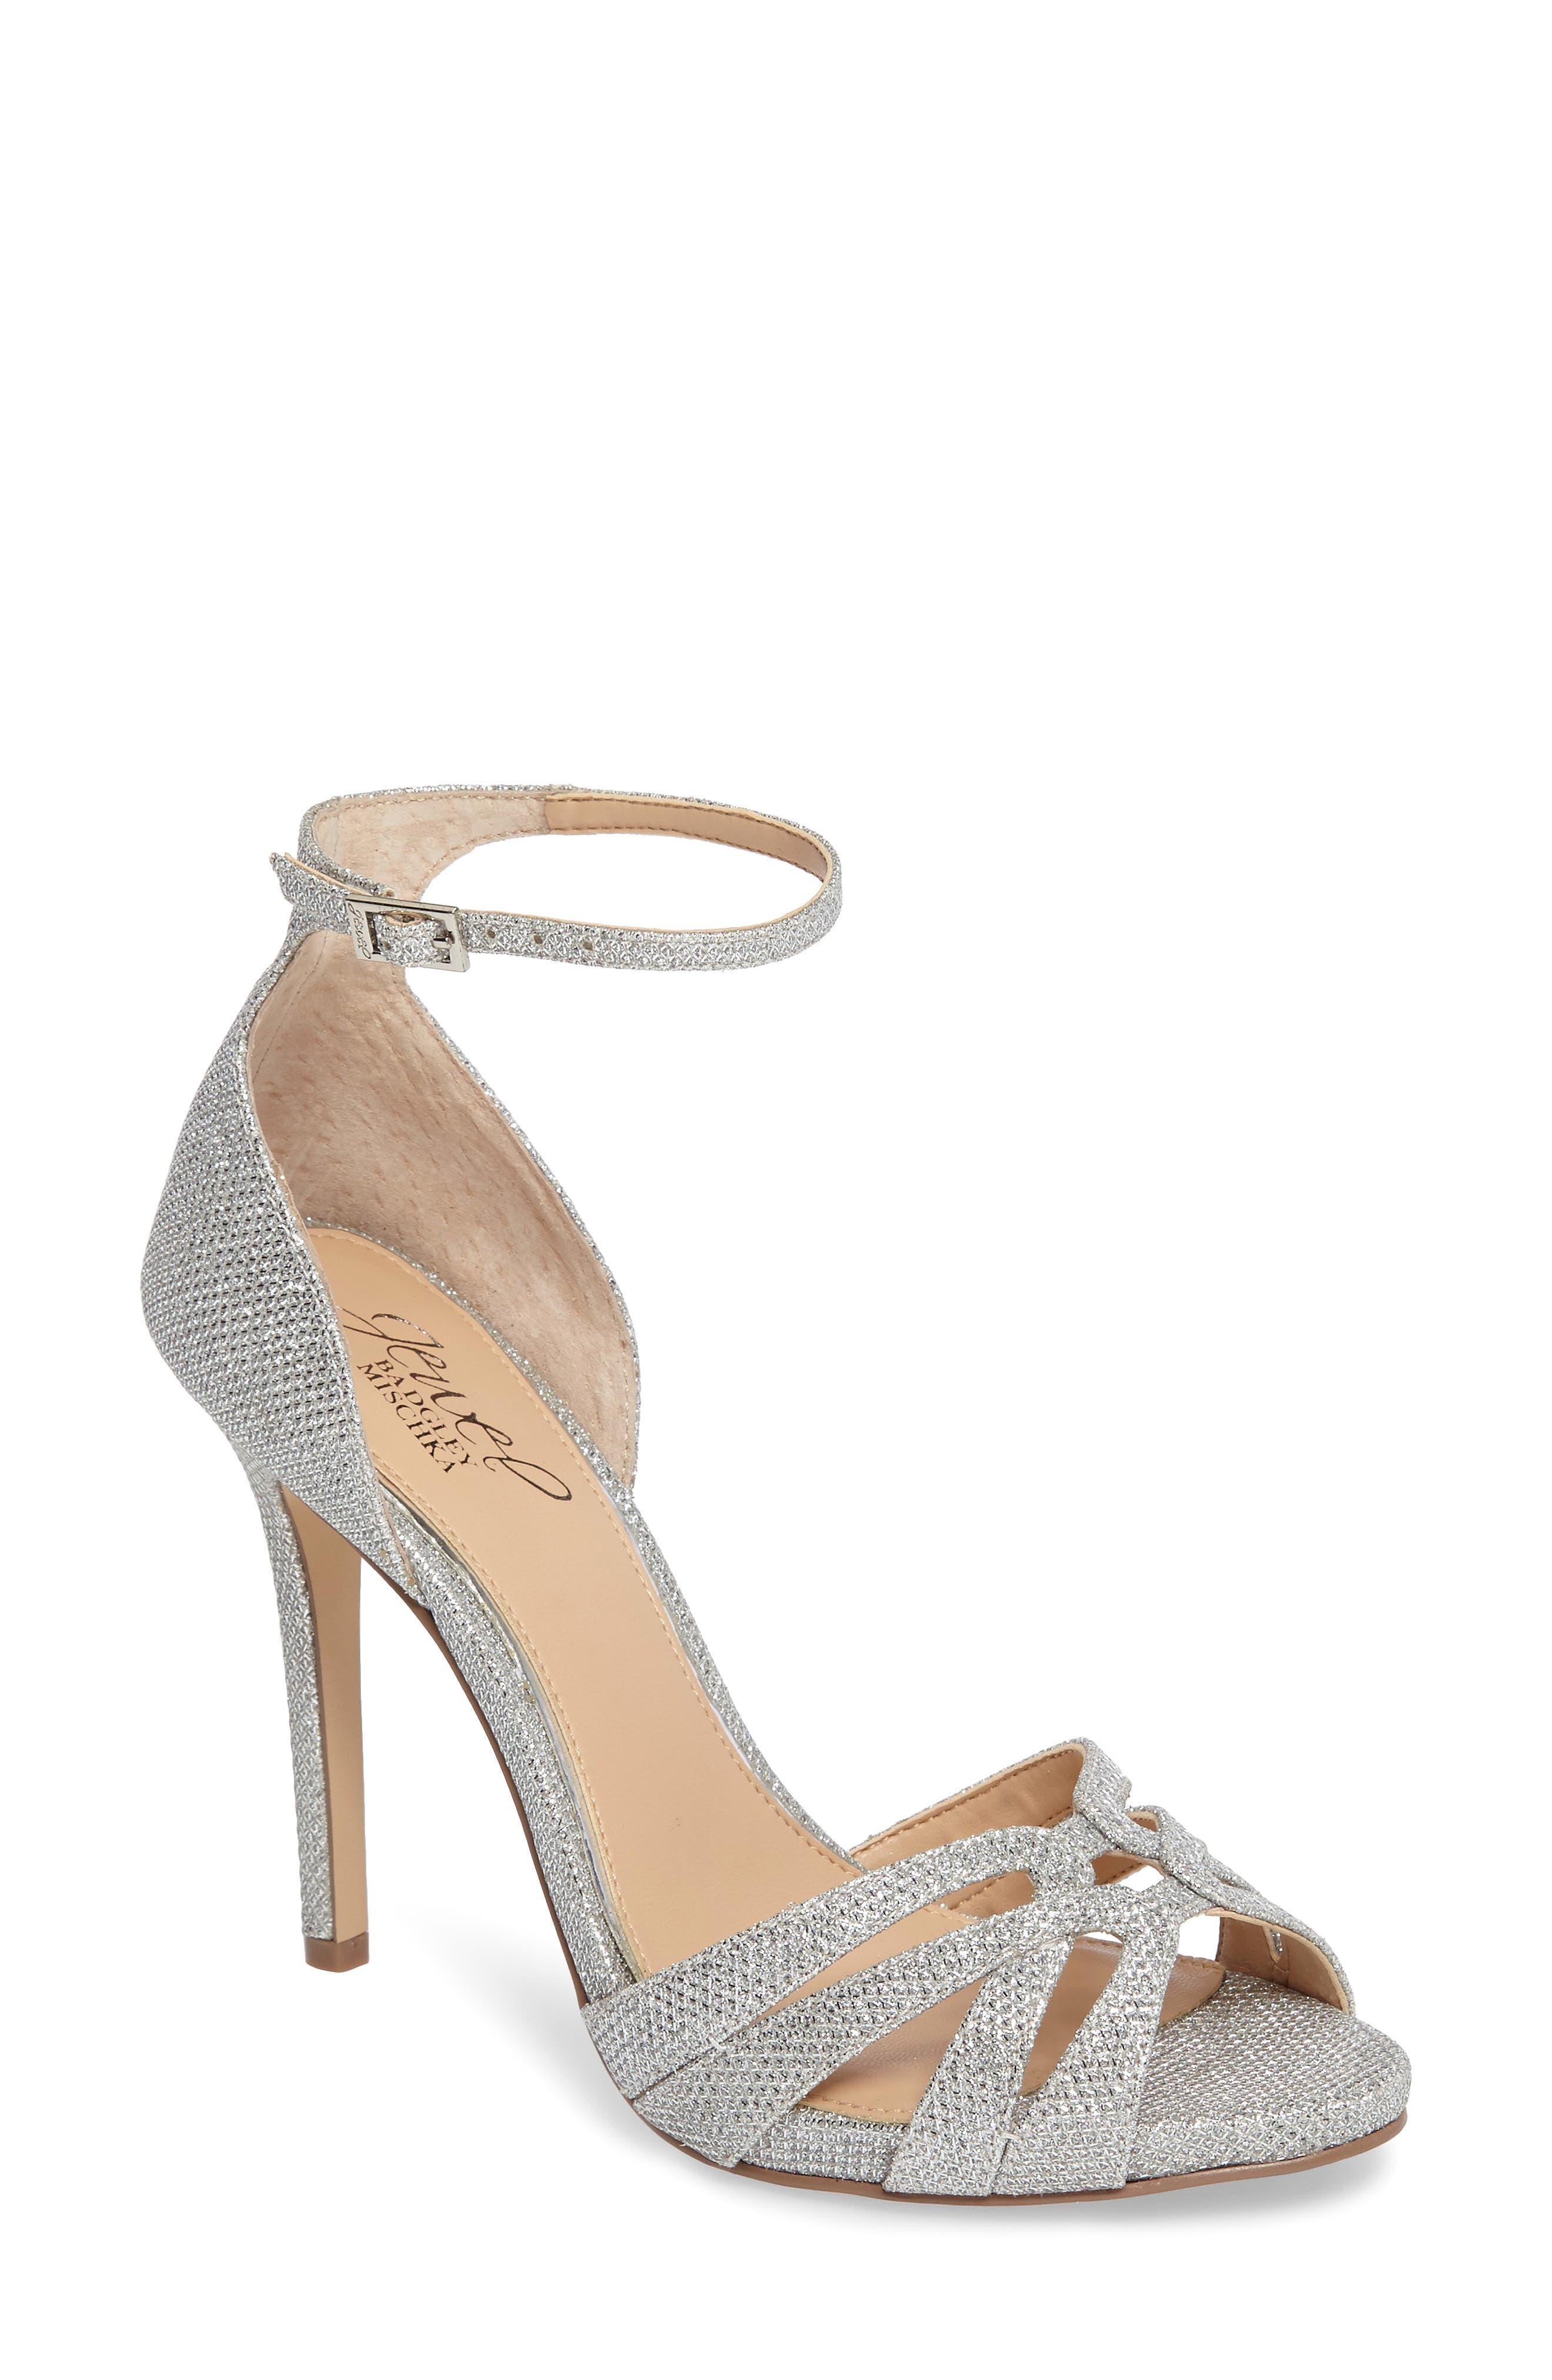 Main Image - Jewel Badgley Mischka Loyal Glitter Sandal (Women)